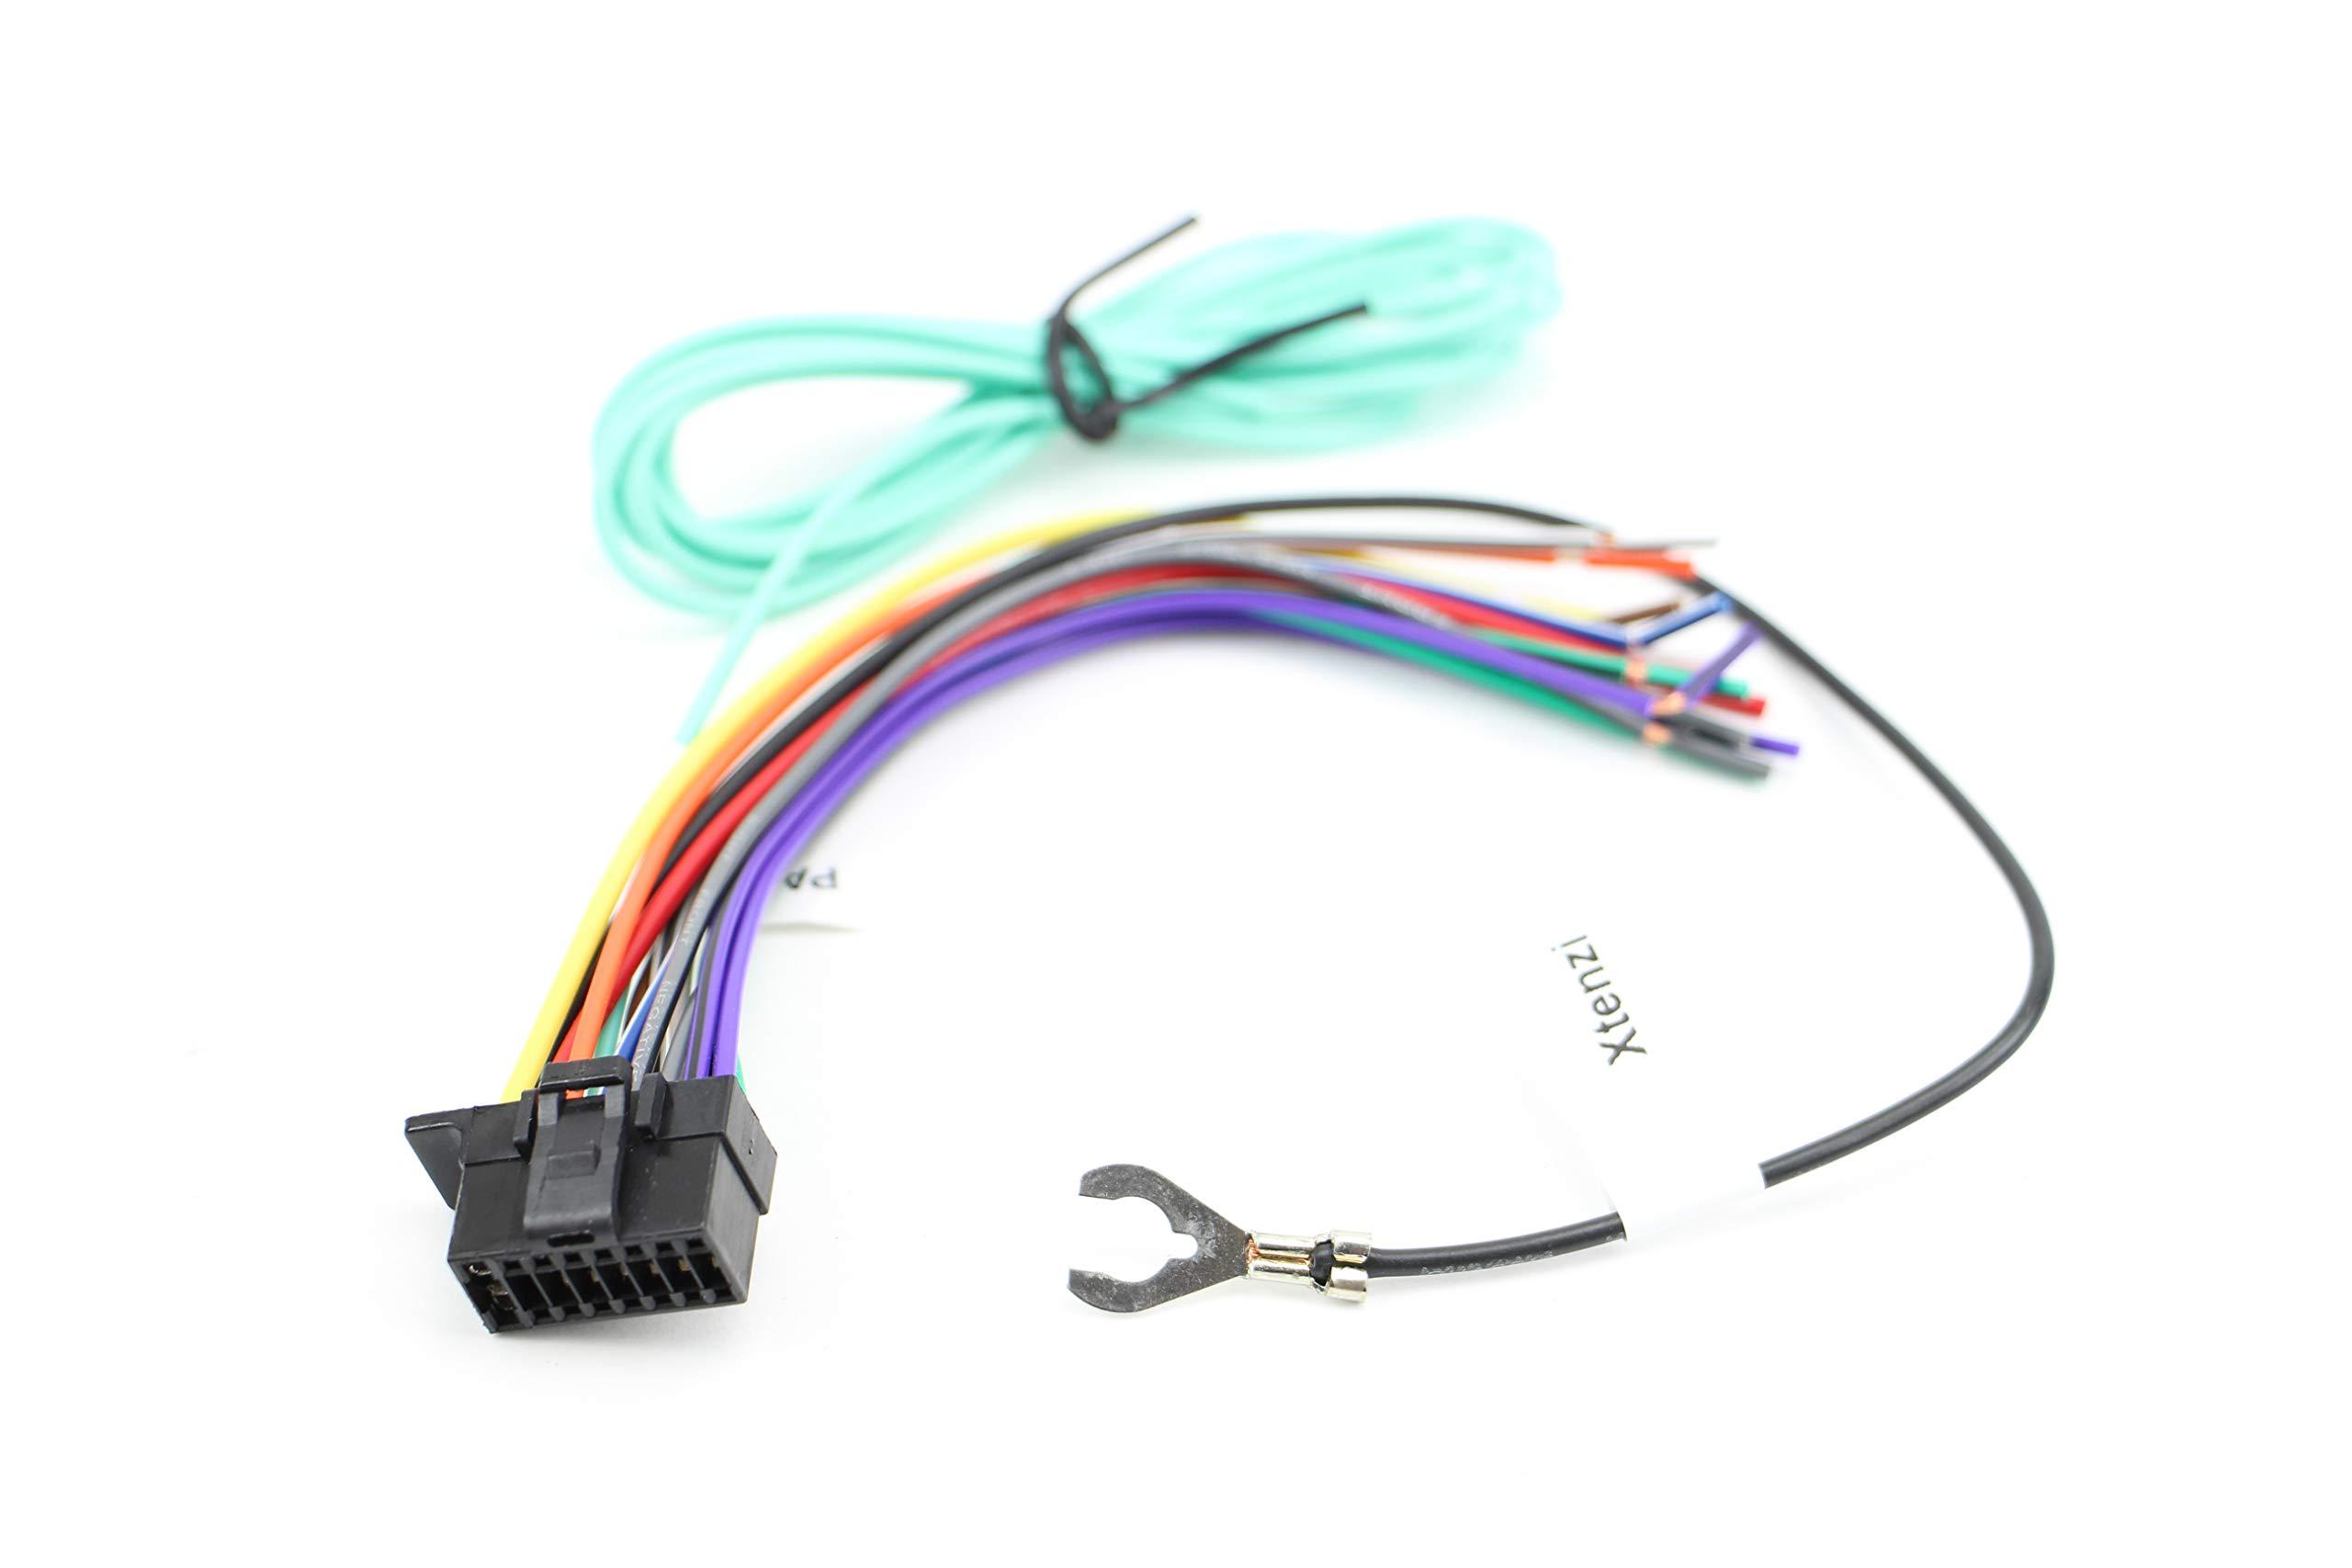 amazon.com: xtenzi 16 pin car radio wire harness compatible with sony cd  dvd navigation in-dash - xt91040  amazon.com